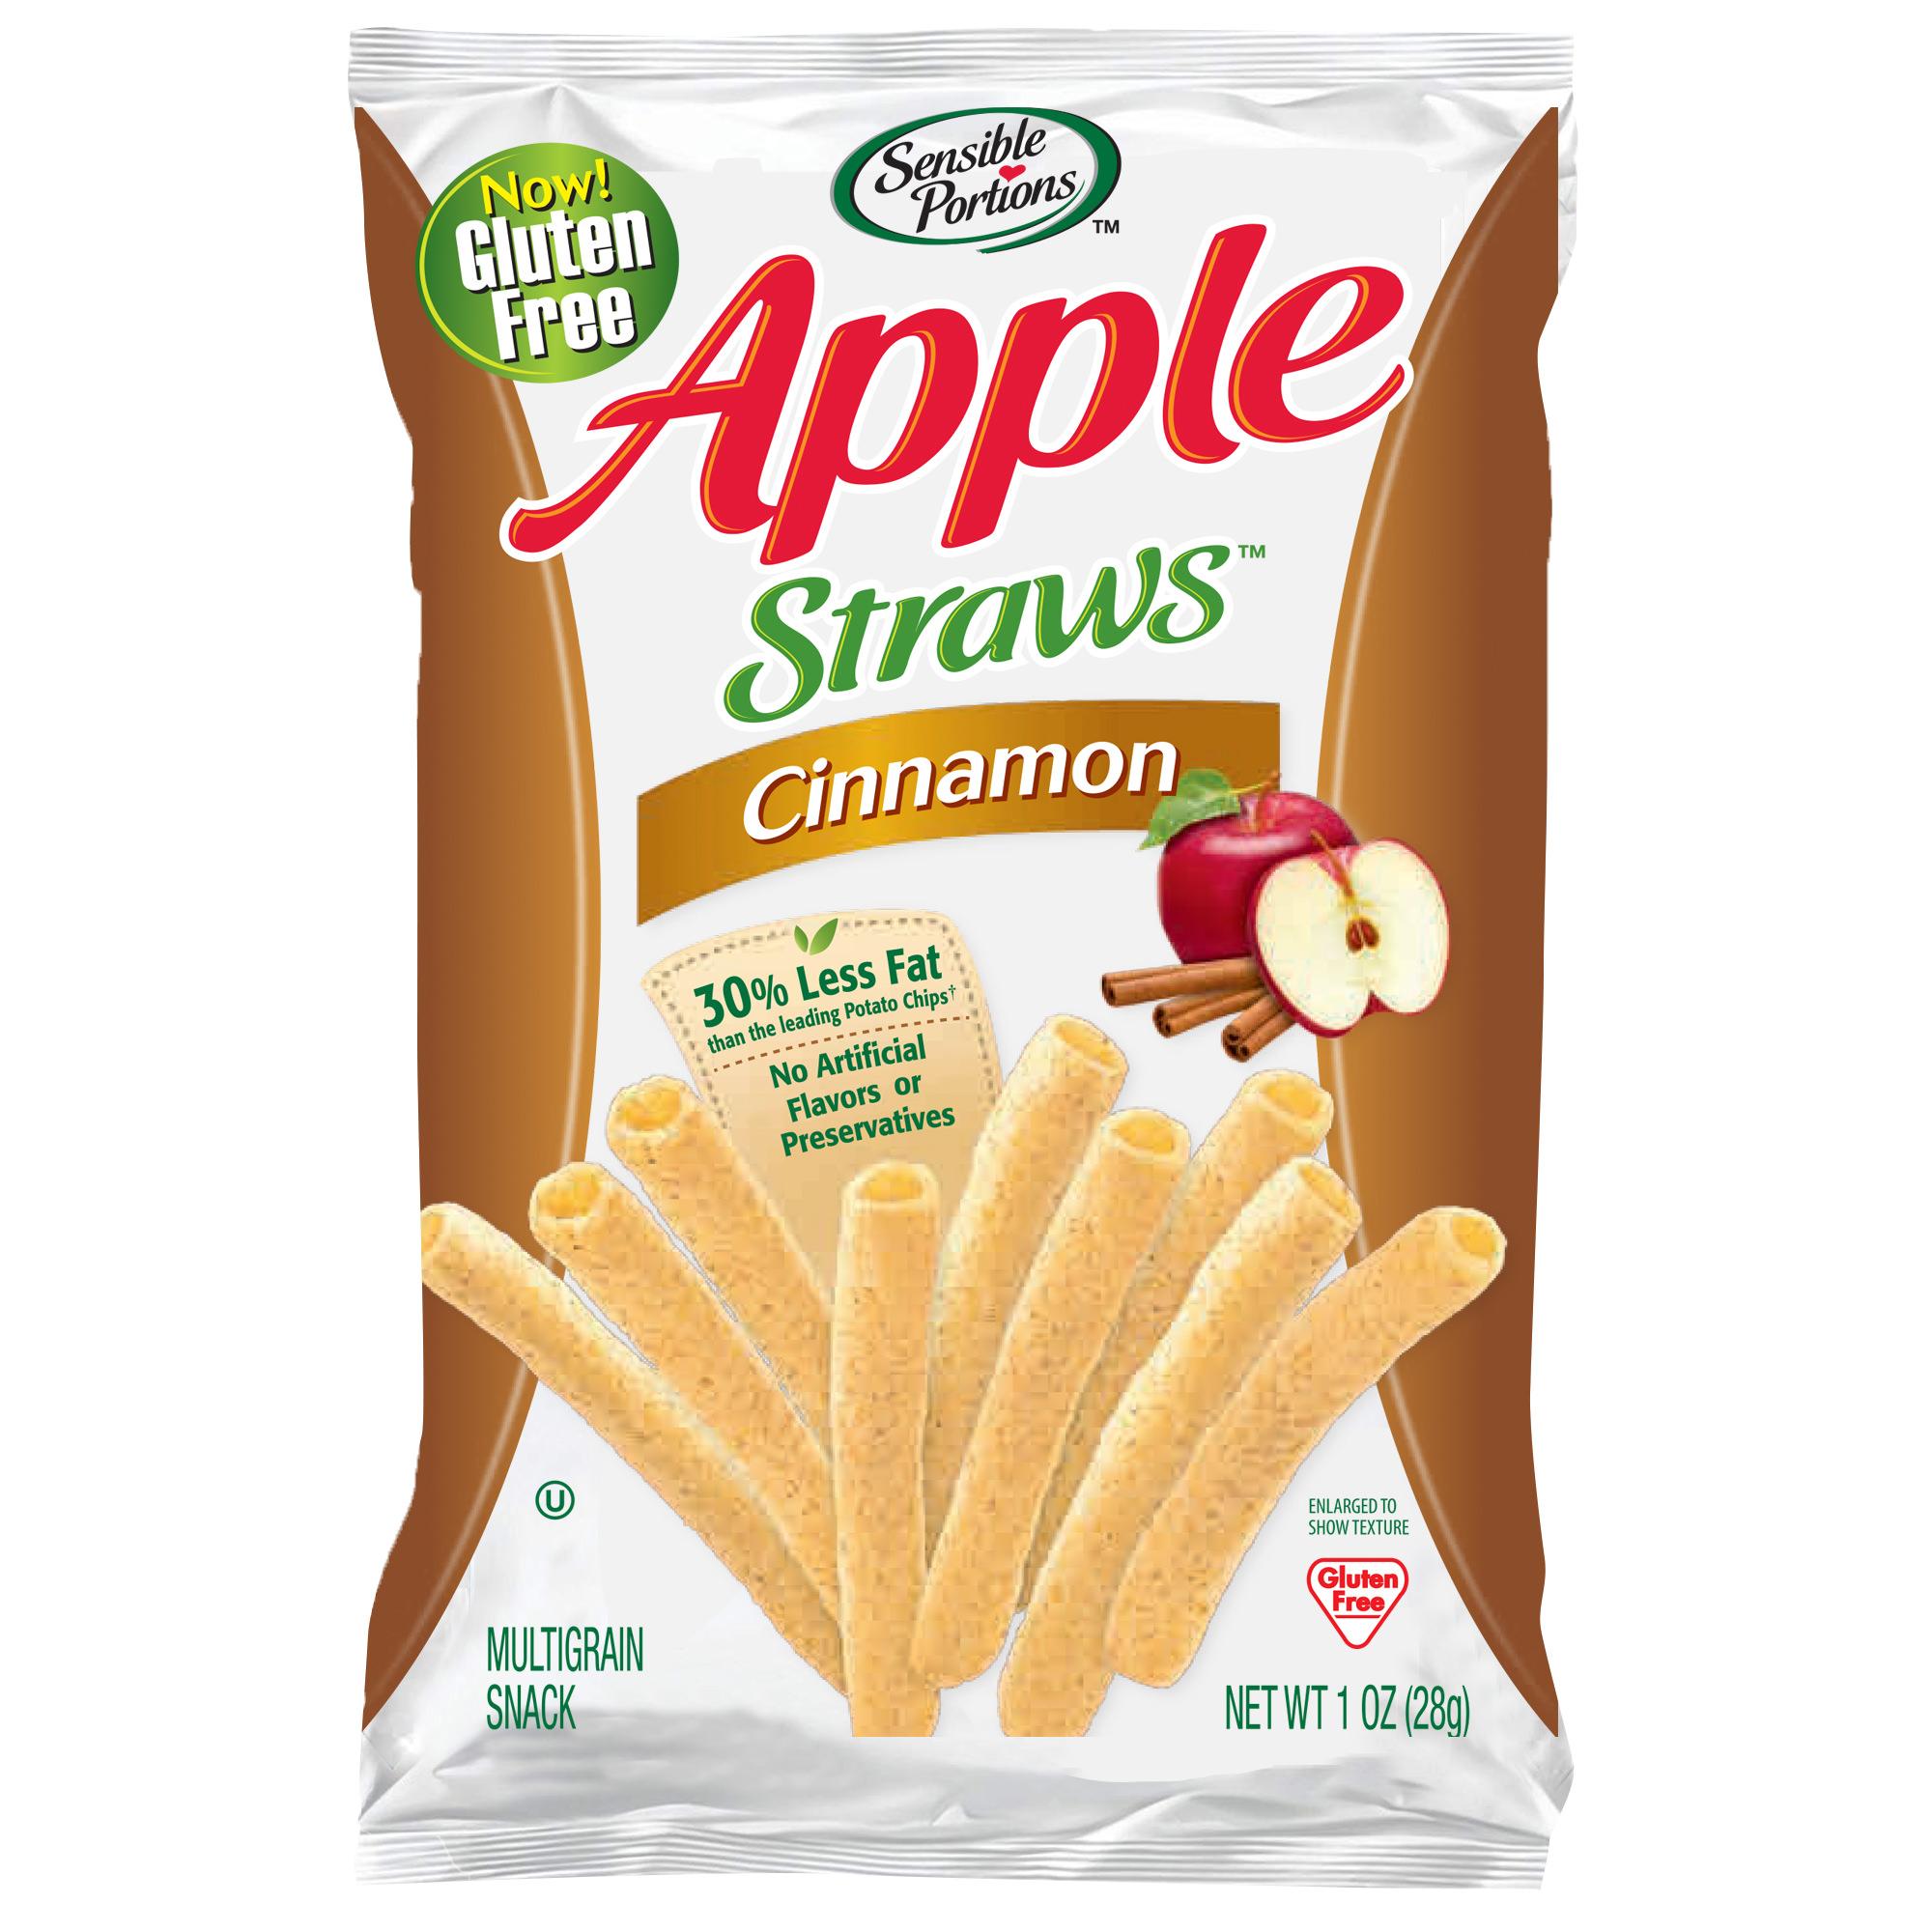 Sensible Portions Apple Straws, Cinnamon, 1 oz. (Pack of 24)